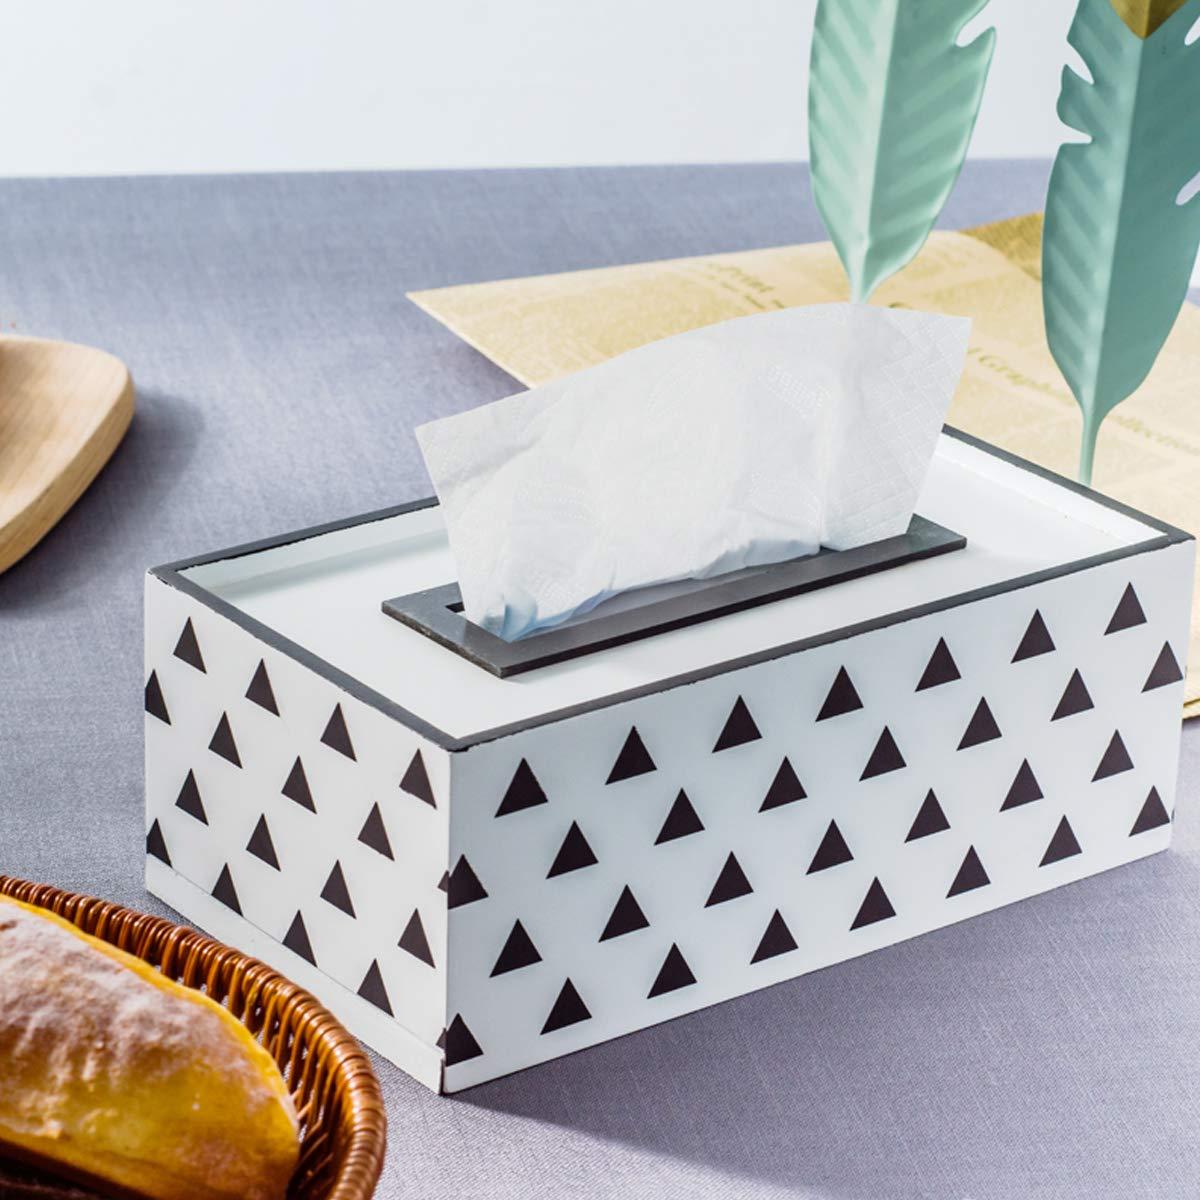 Yoillione Rectangle Tissue Box Cover Wood Kleenex Box Slide-Out Bottom Panel for Easy Replacement Napkins Box Cover Holder Black Line Lattice